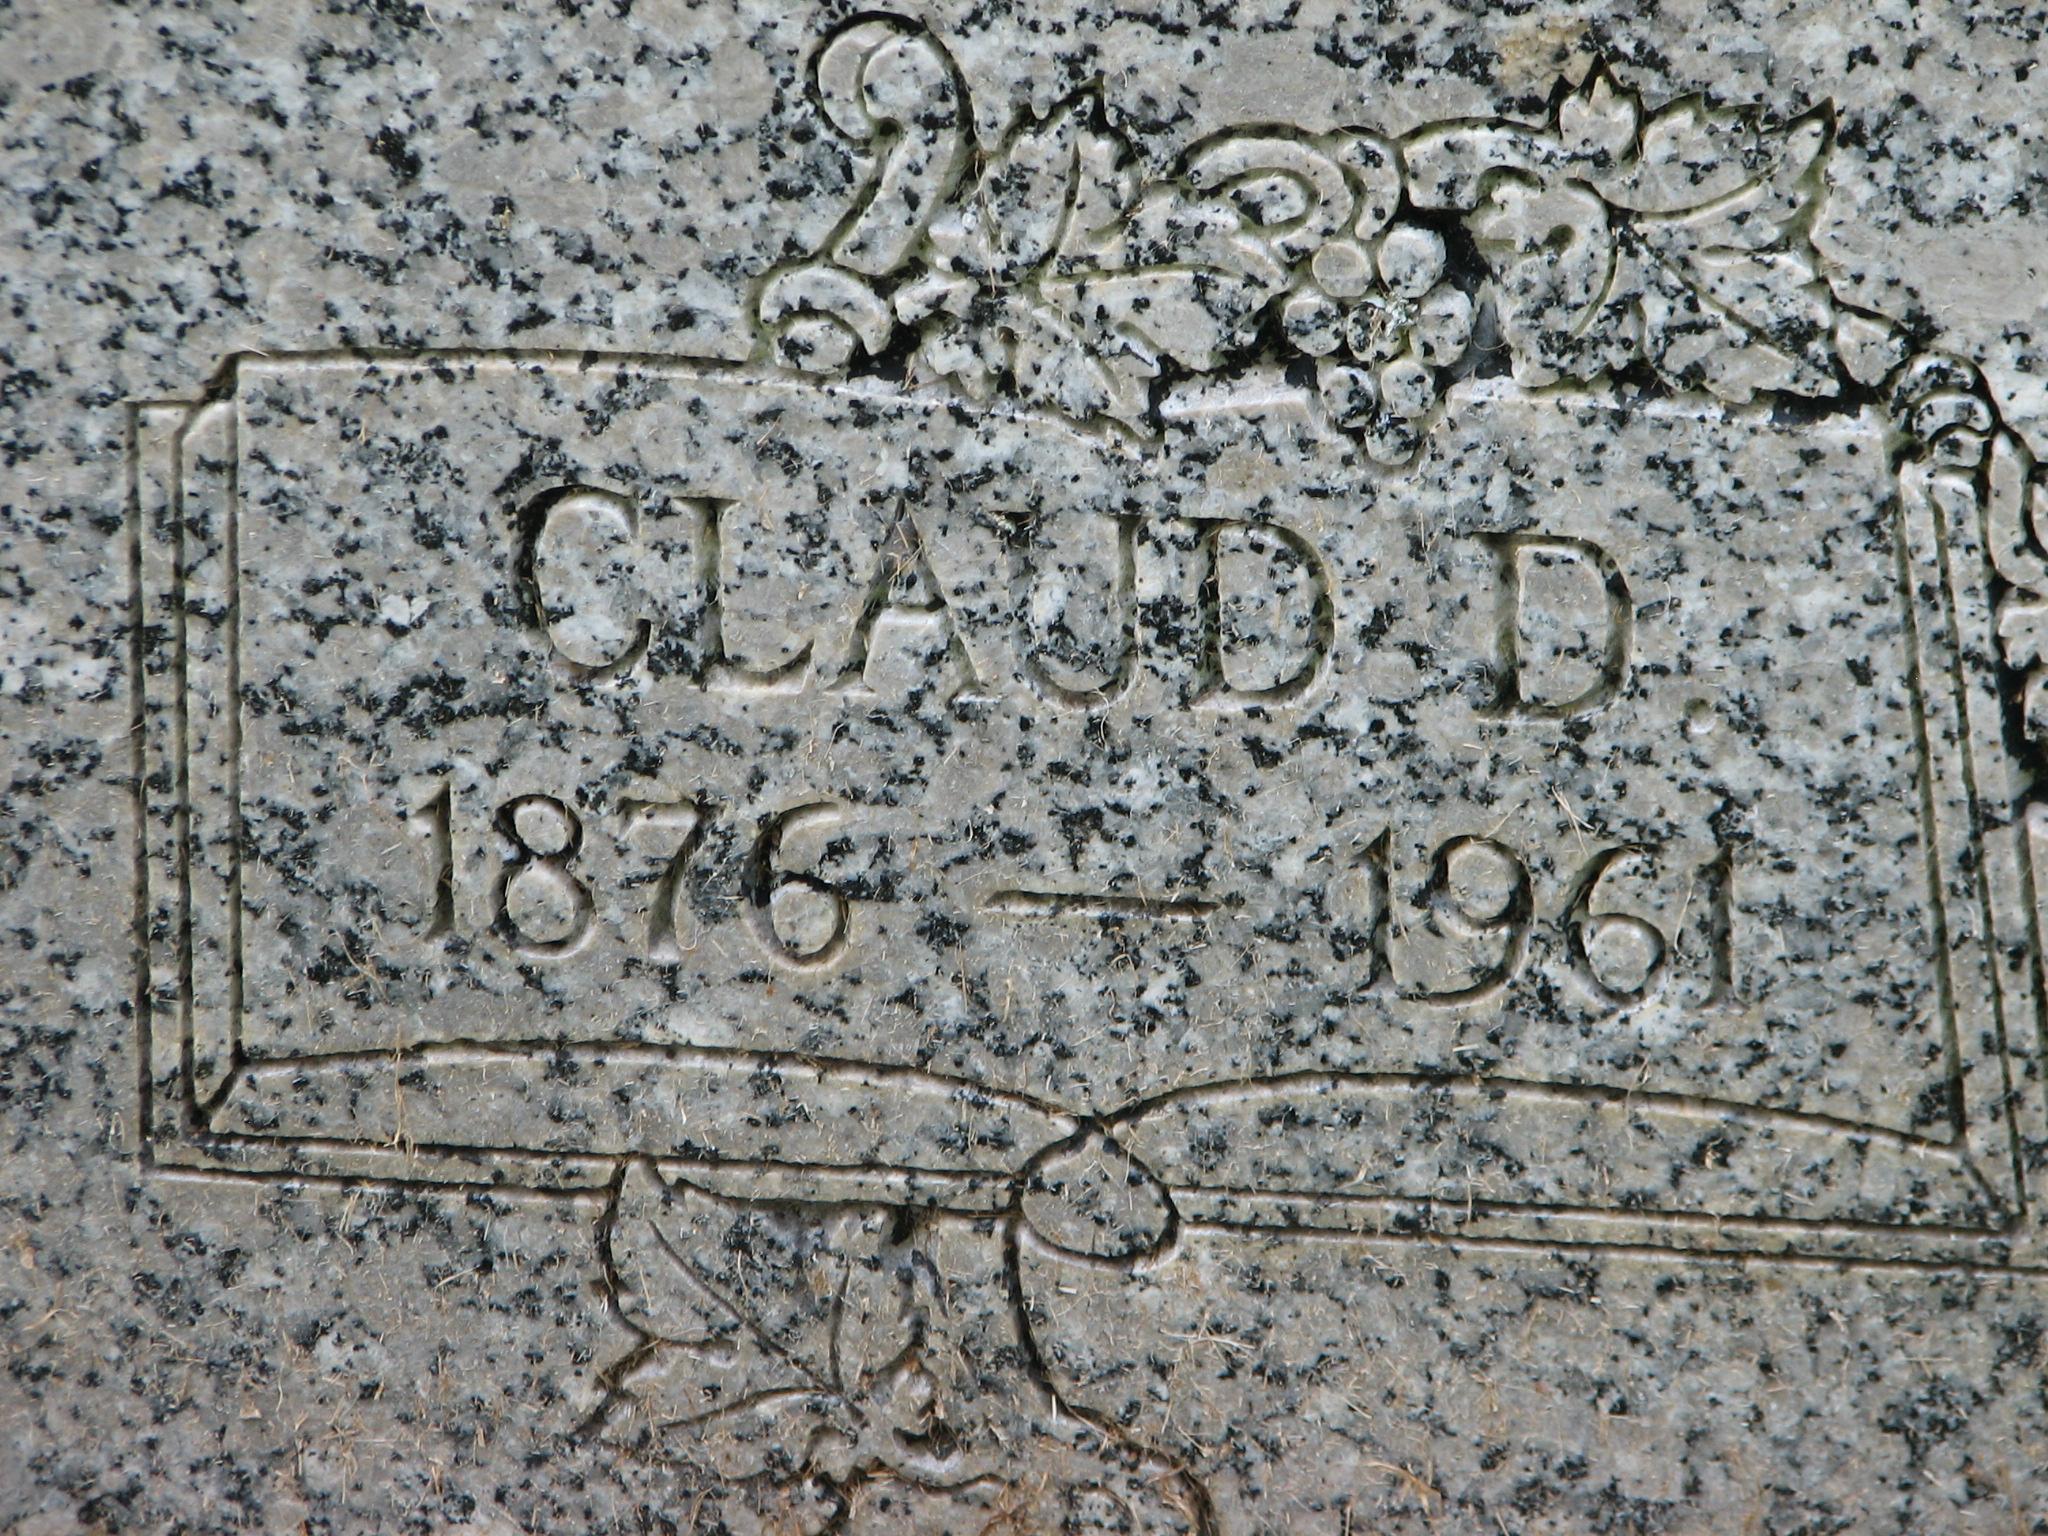 Claud Duvall Davenport